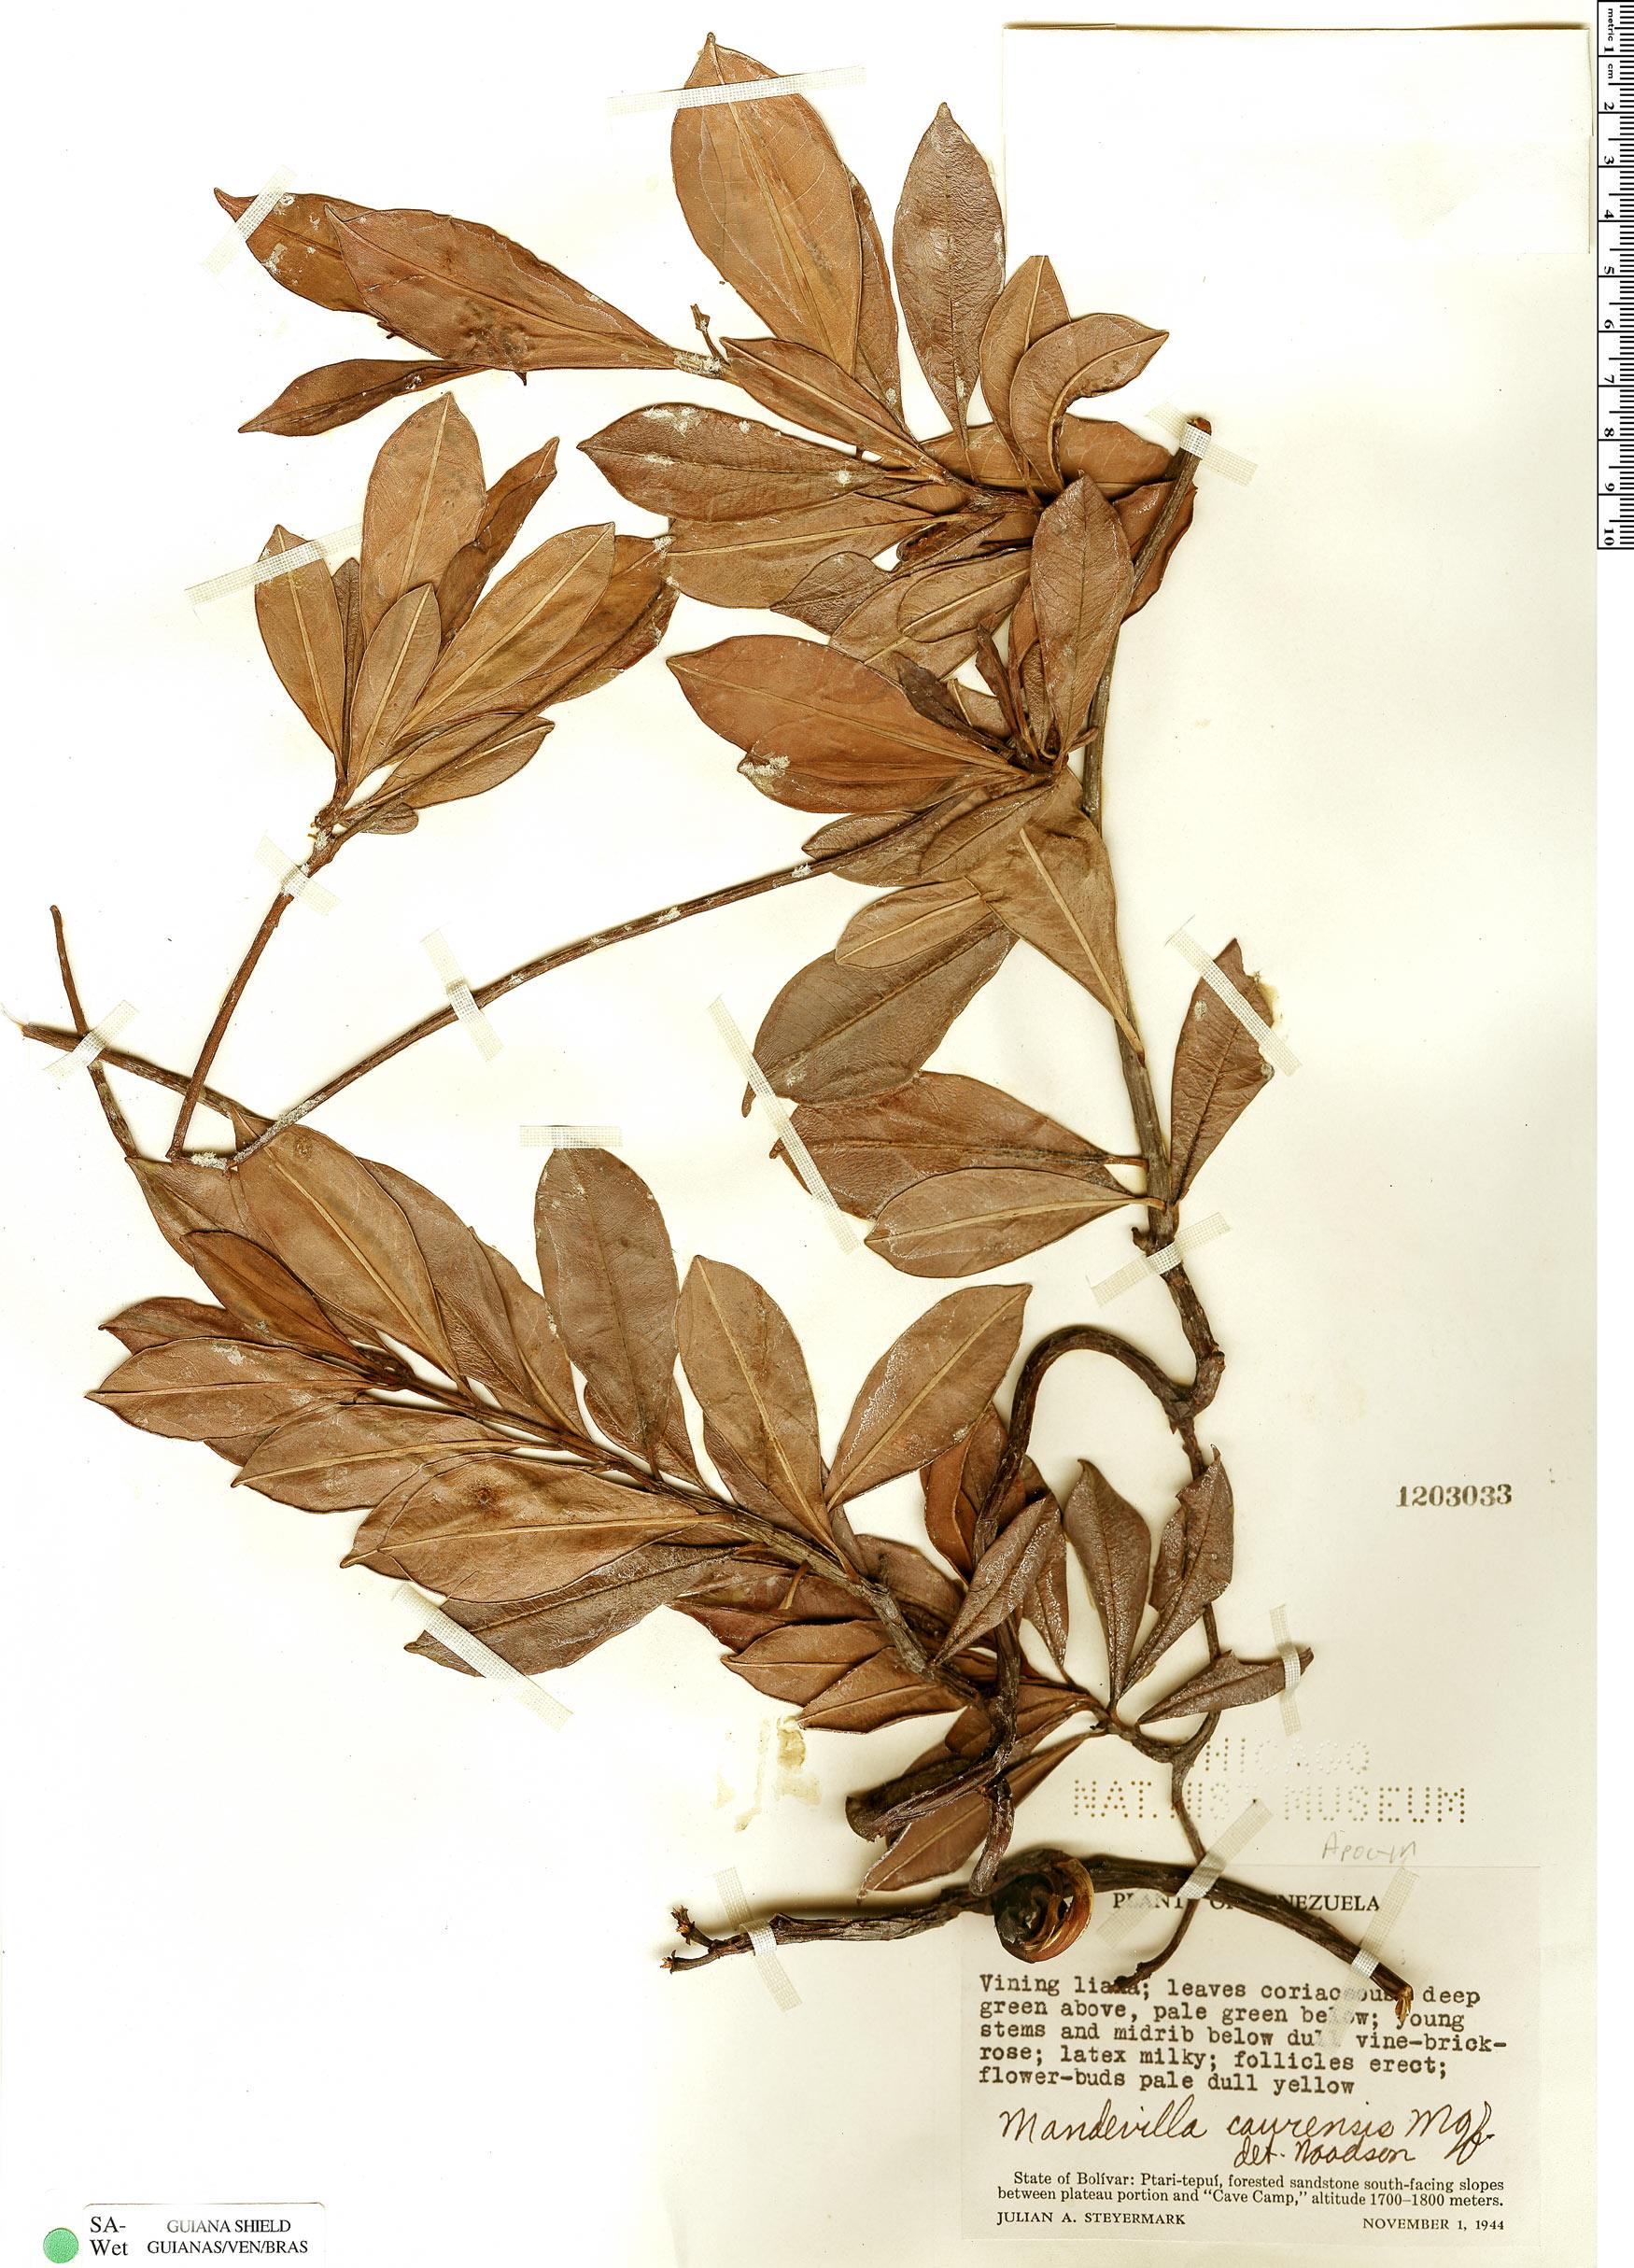 Specimen: Mandevilla caurensis